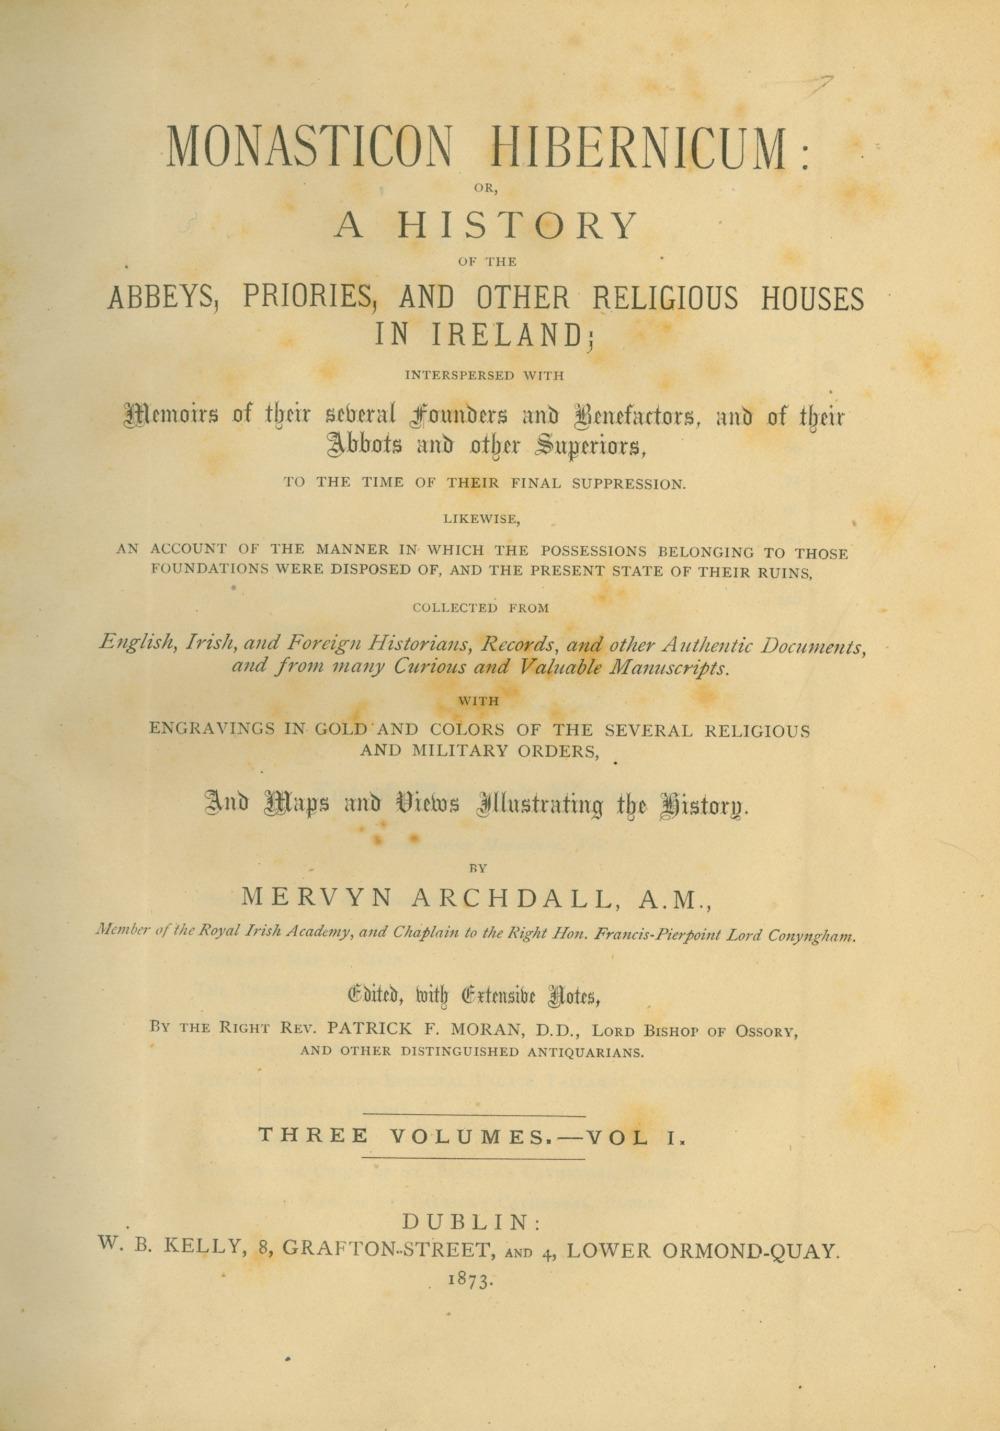 Archdall (Mervyn) Monasticon Hibernicum: or A History of the Abbeys,